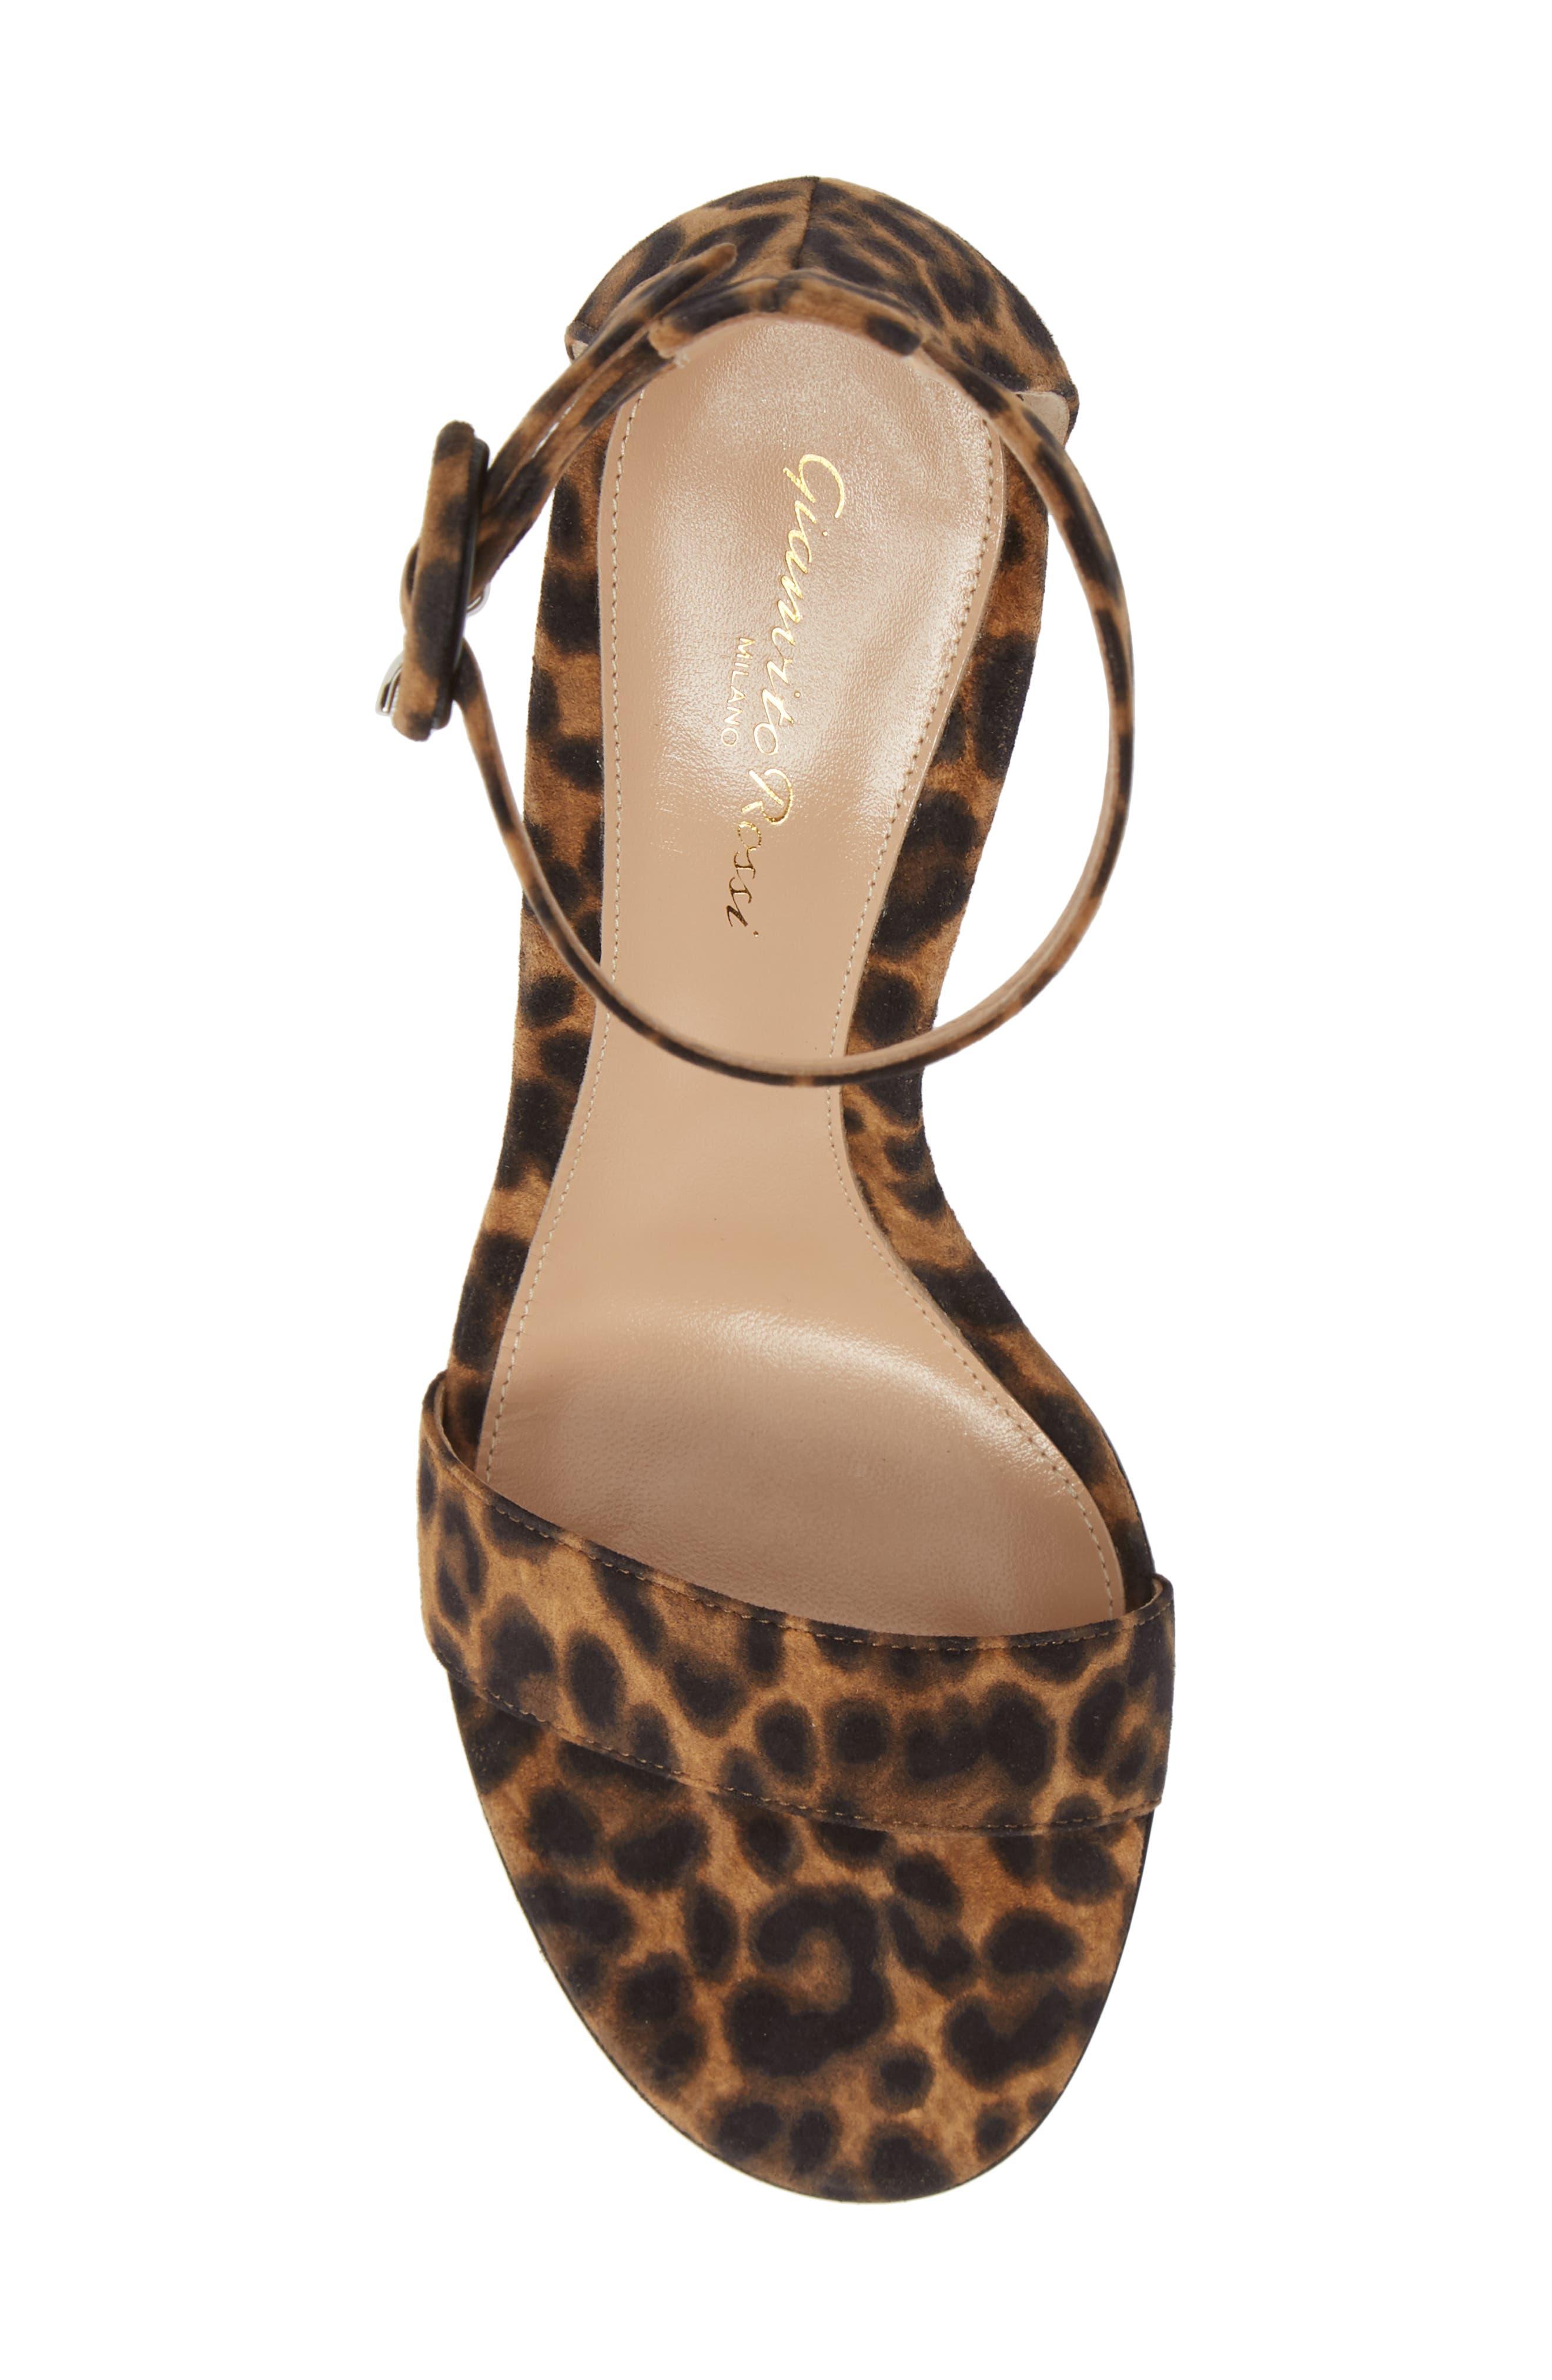 GIANVITO ROSSI, Leopard Print Ankle Strap Sandal, Alternate thumbnail 5, color, LEOPARD